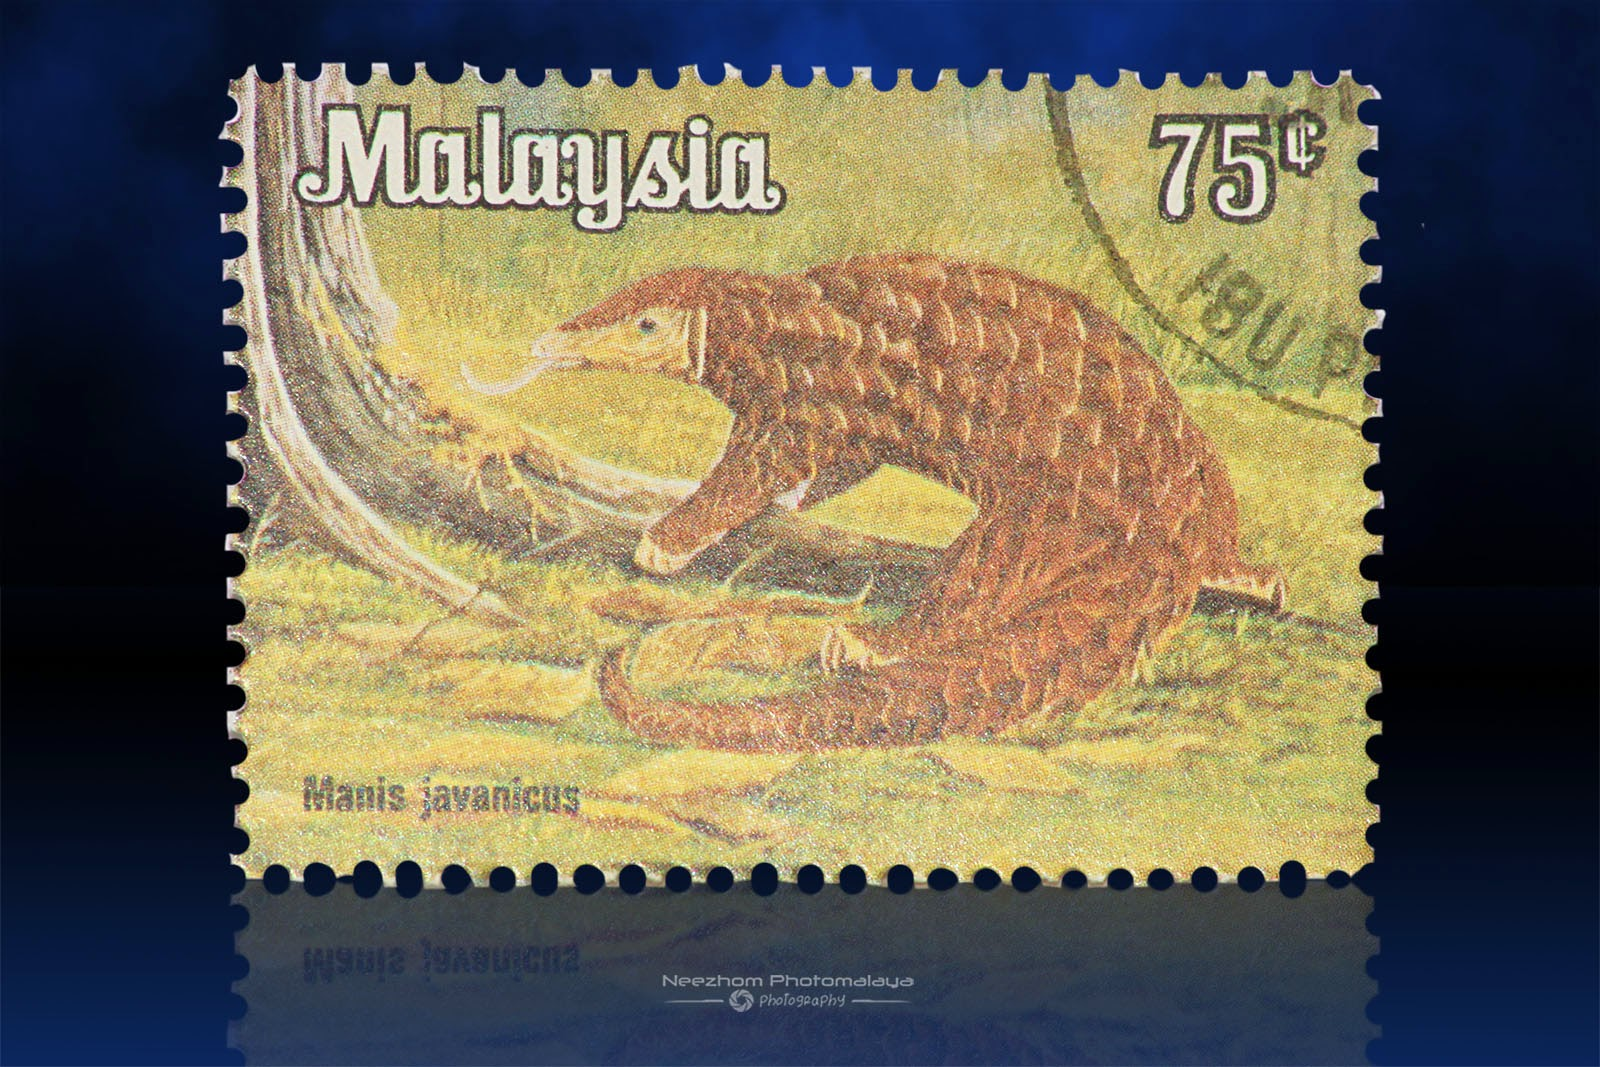 National Animals Series 1979 stamps - 75 Sen Manis Javanicus